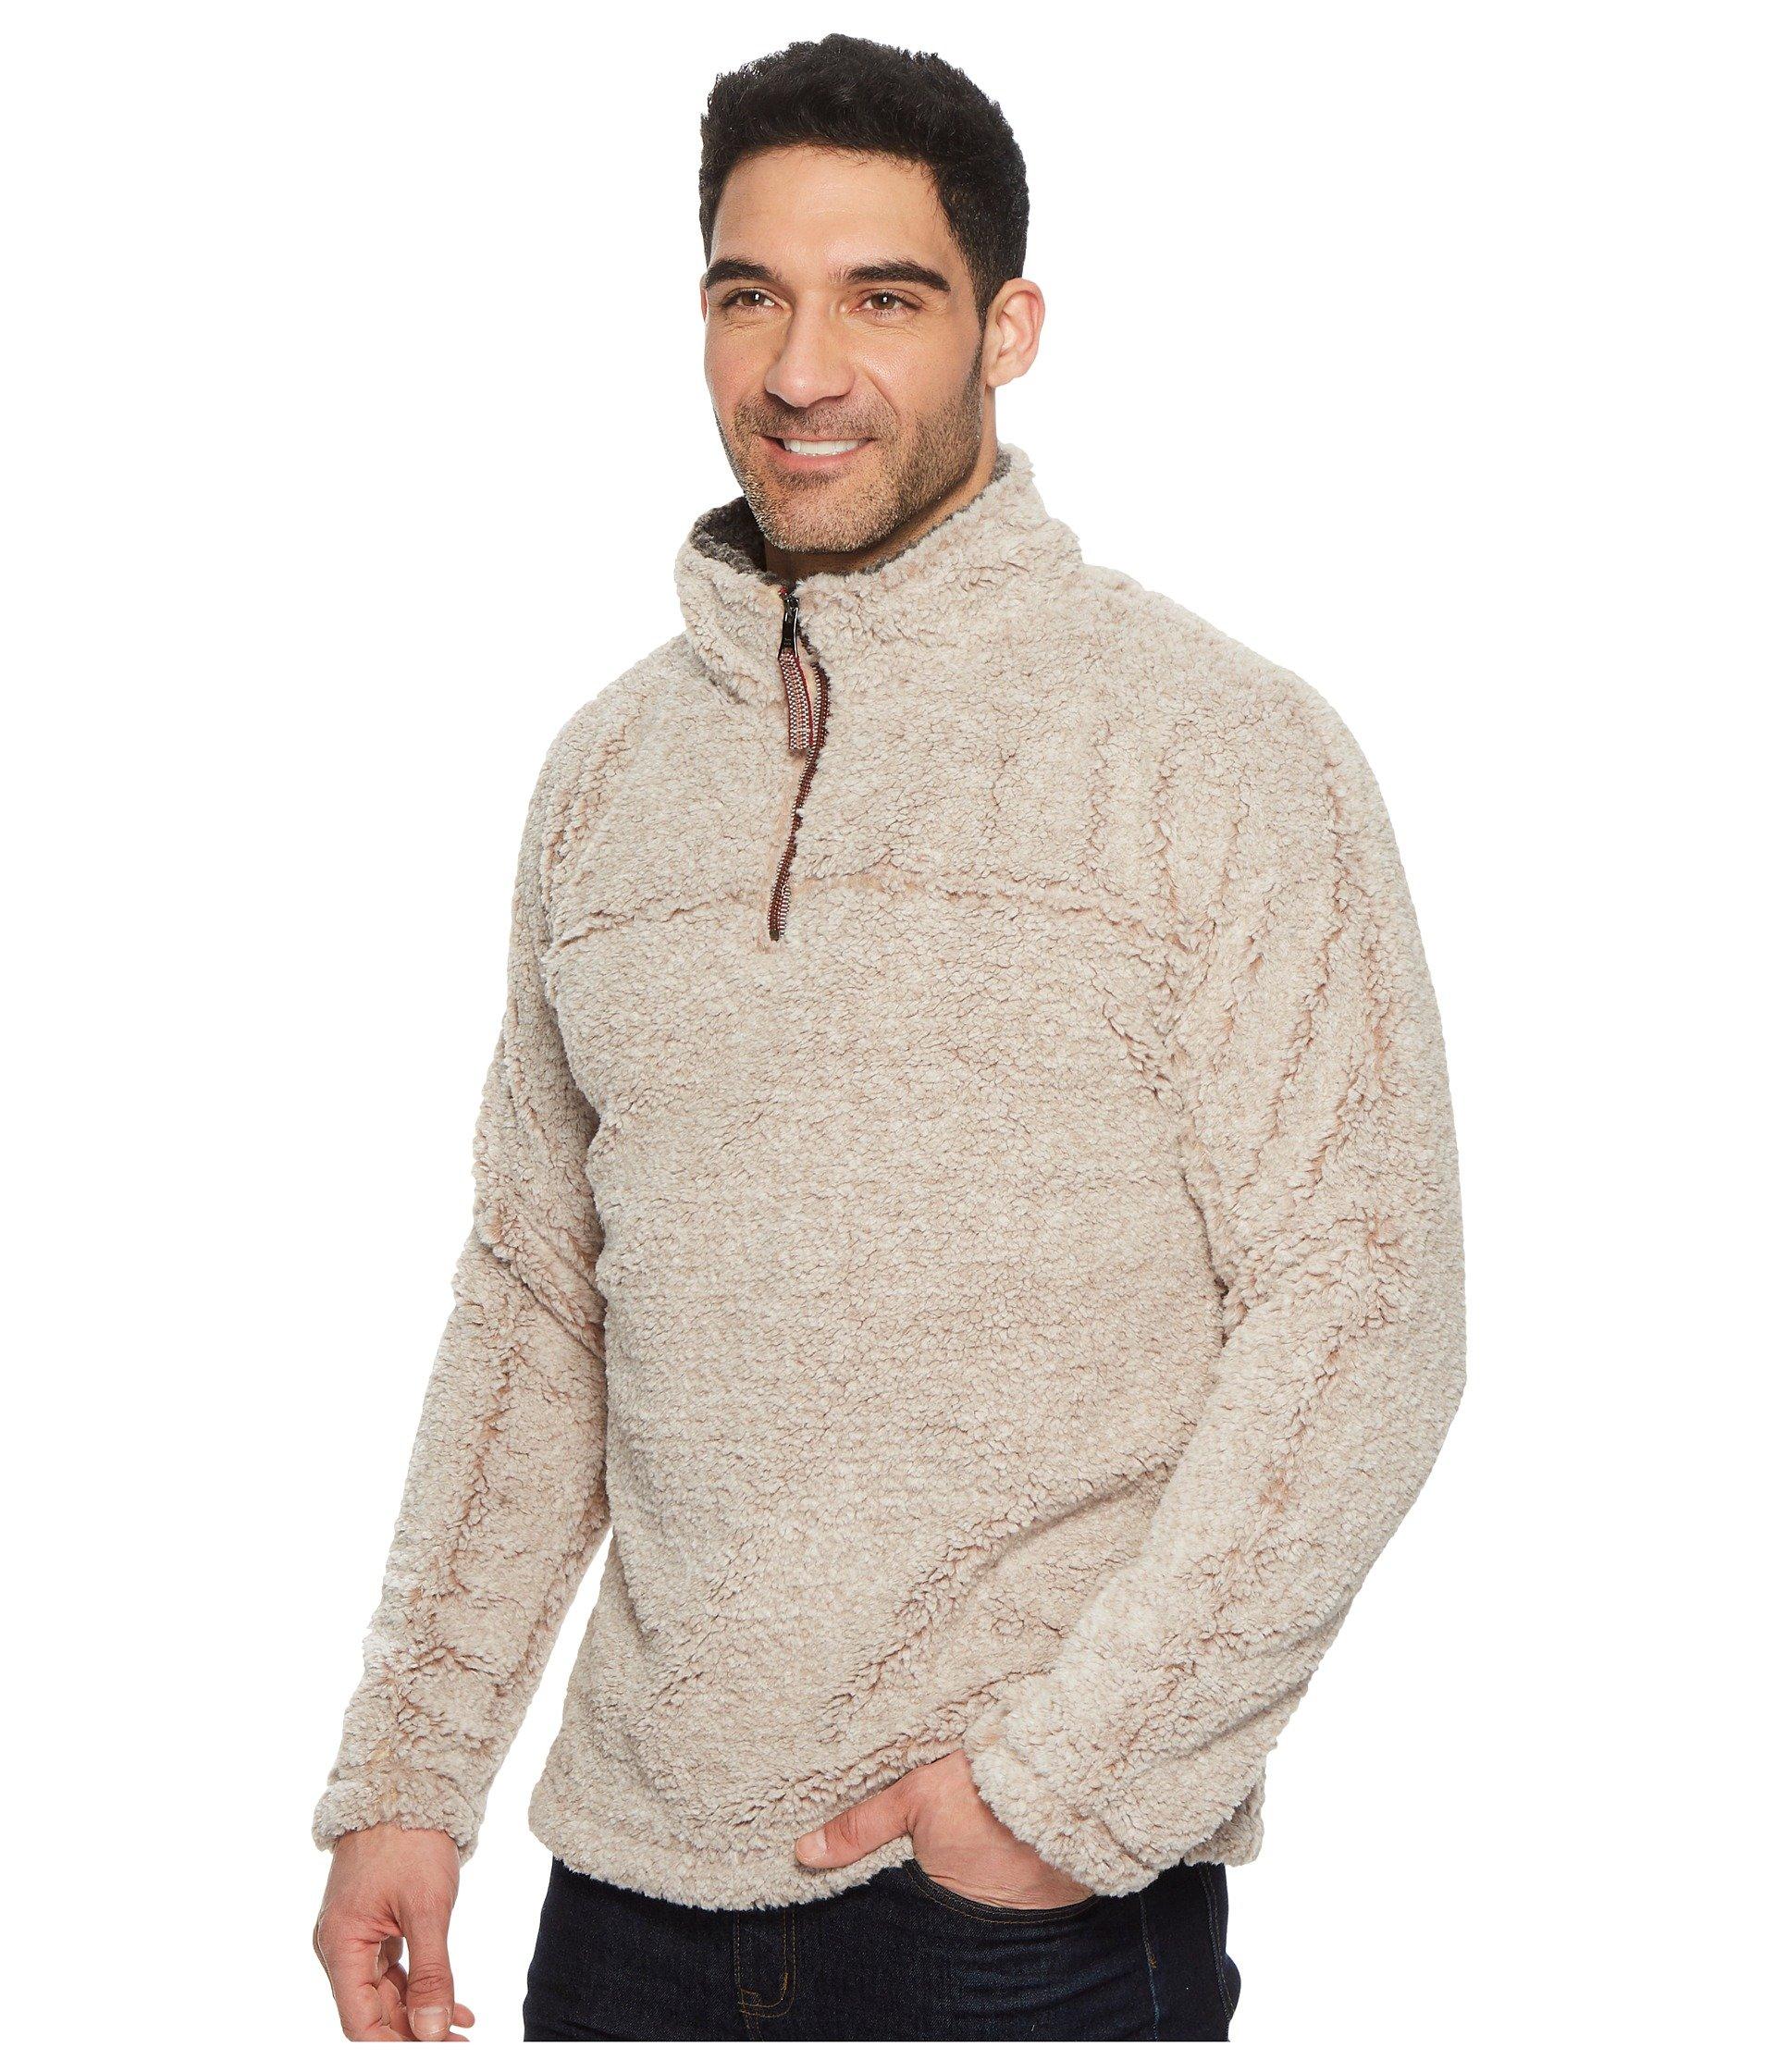 Shearling Grit Zip Pullover 1 True Oatmeal Luxe 4 Melange qntAxH4T